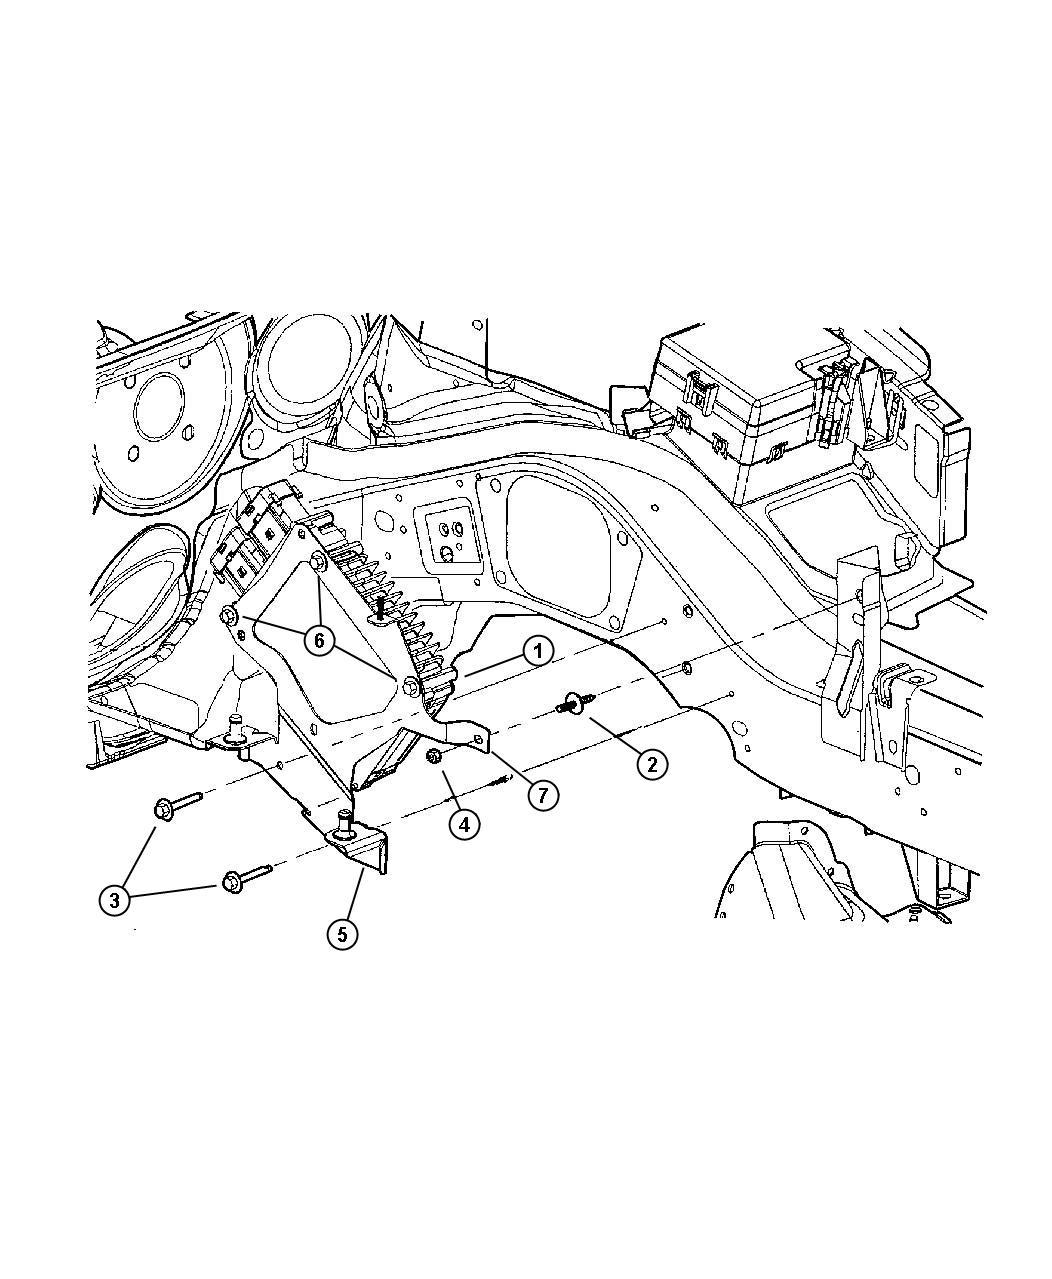 Chrysler Sebring Engine Control Modules 2 0l I4 Dohc